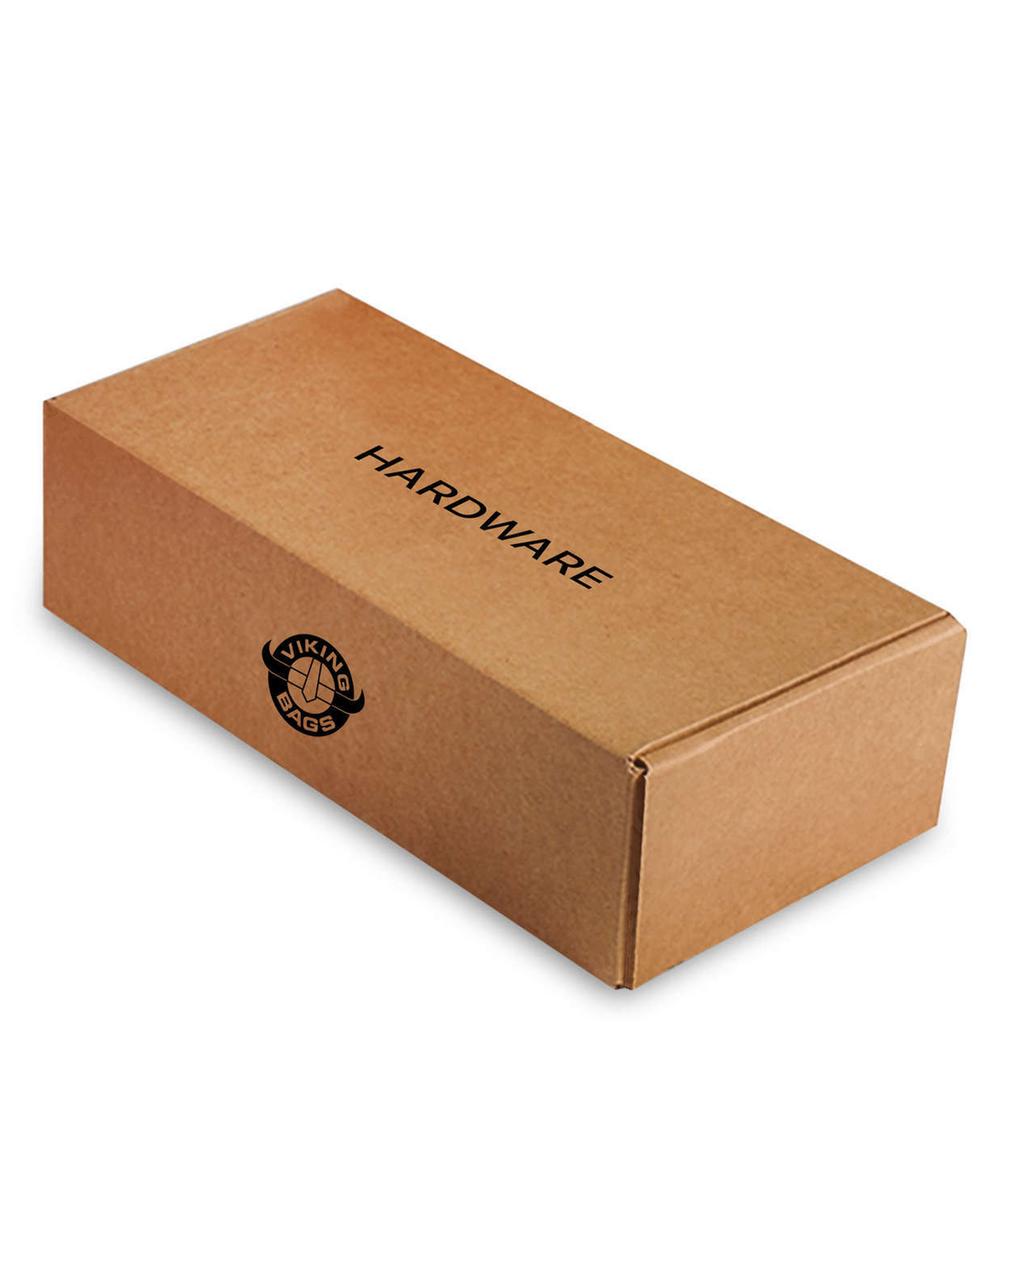 Honda VTX 1300 C Charger Braided Motorcycle Saddlebags Hardware Box